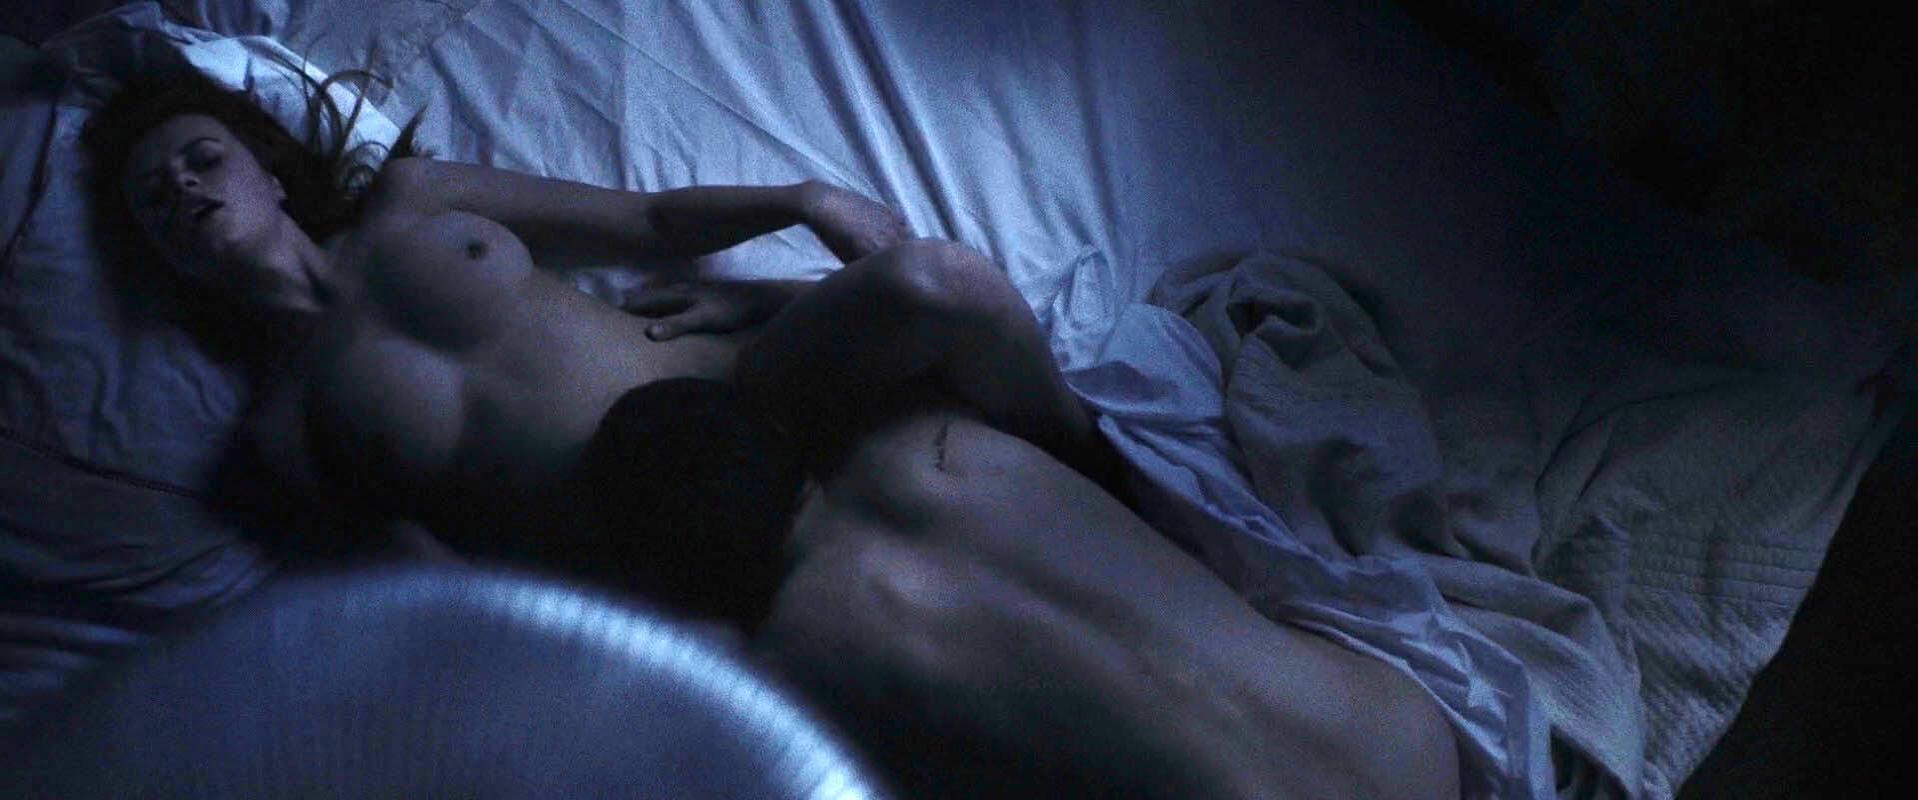 Abigail Hardingham nude, Fiona O'Shaughnessy nude - Nina Forever (2015)